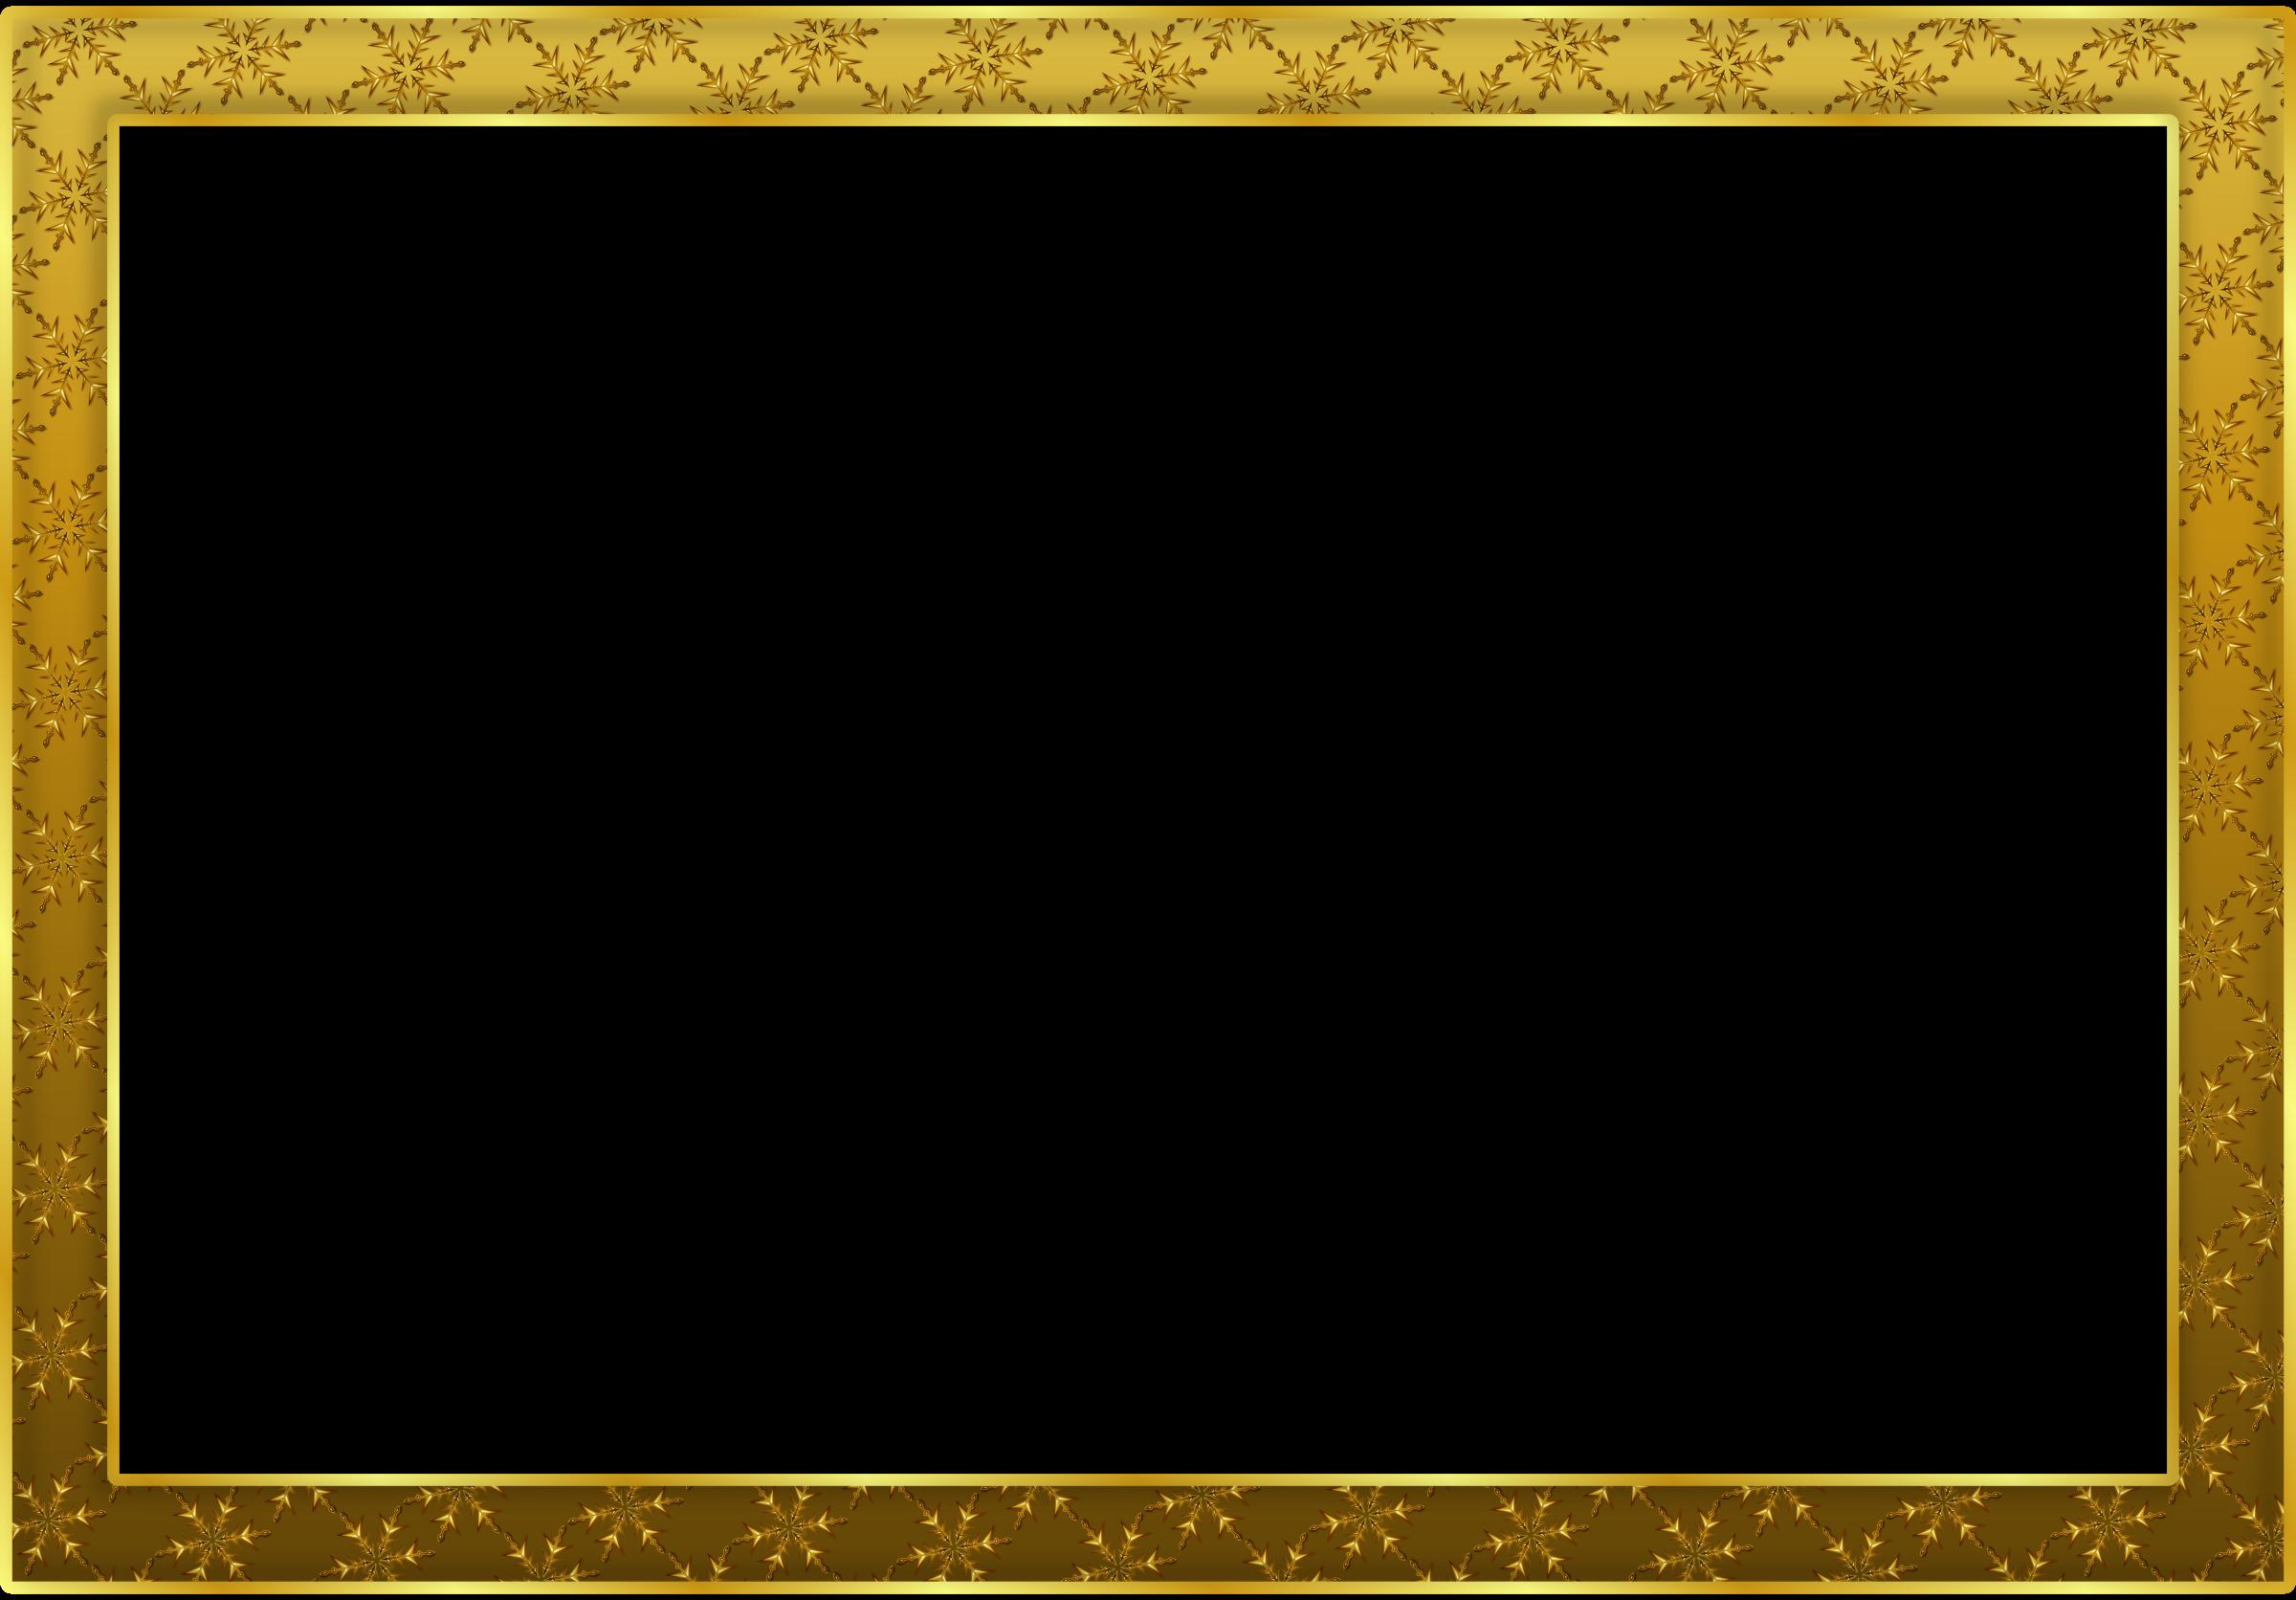 Download Gold Frame Free PNG Image.